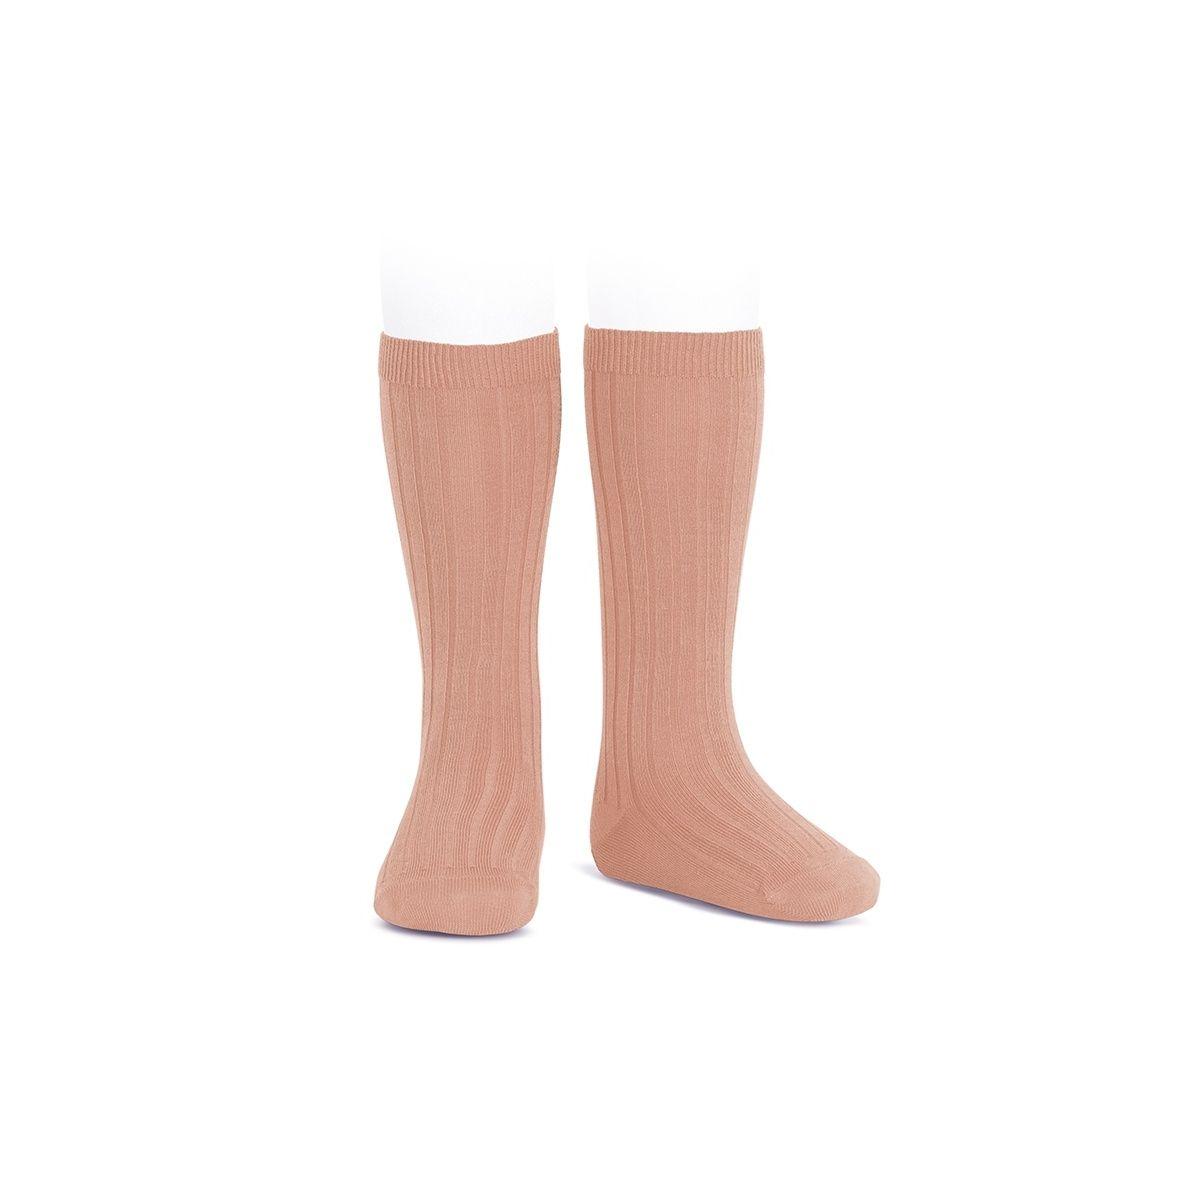 Wide Ribbed Cotton Knee High Socks peony - Condor